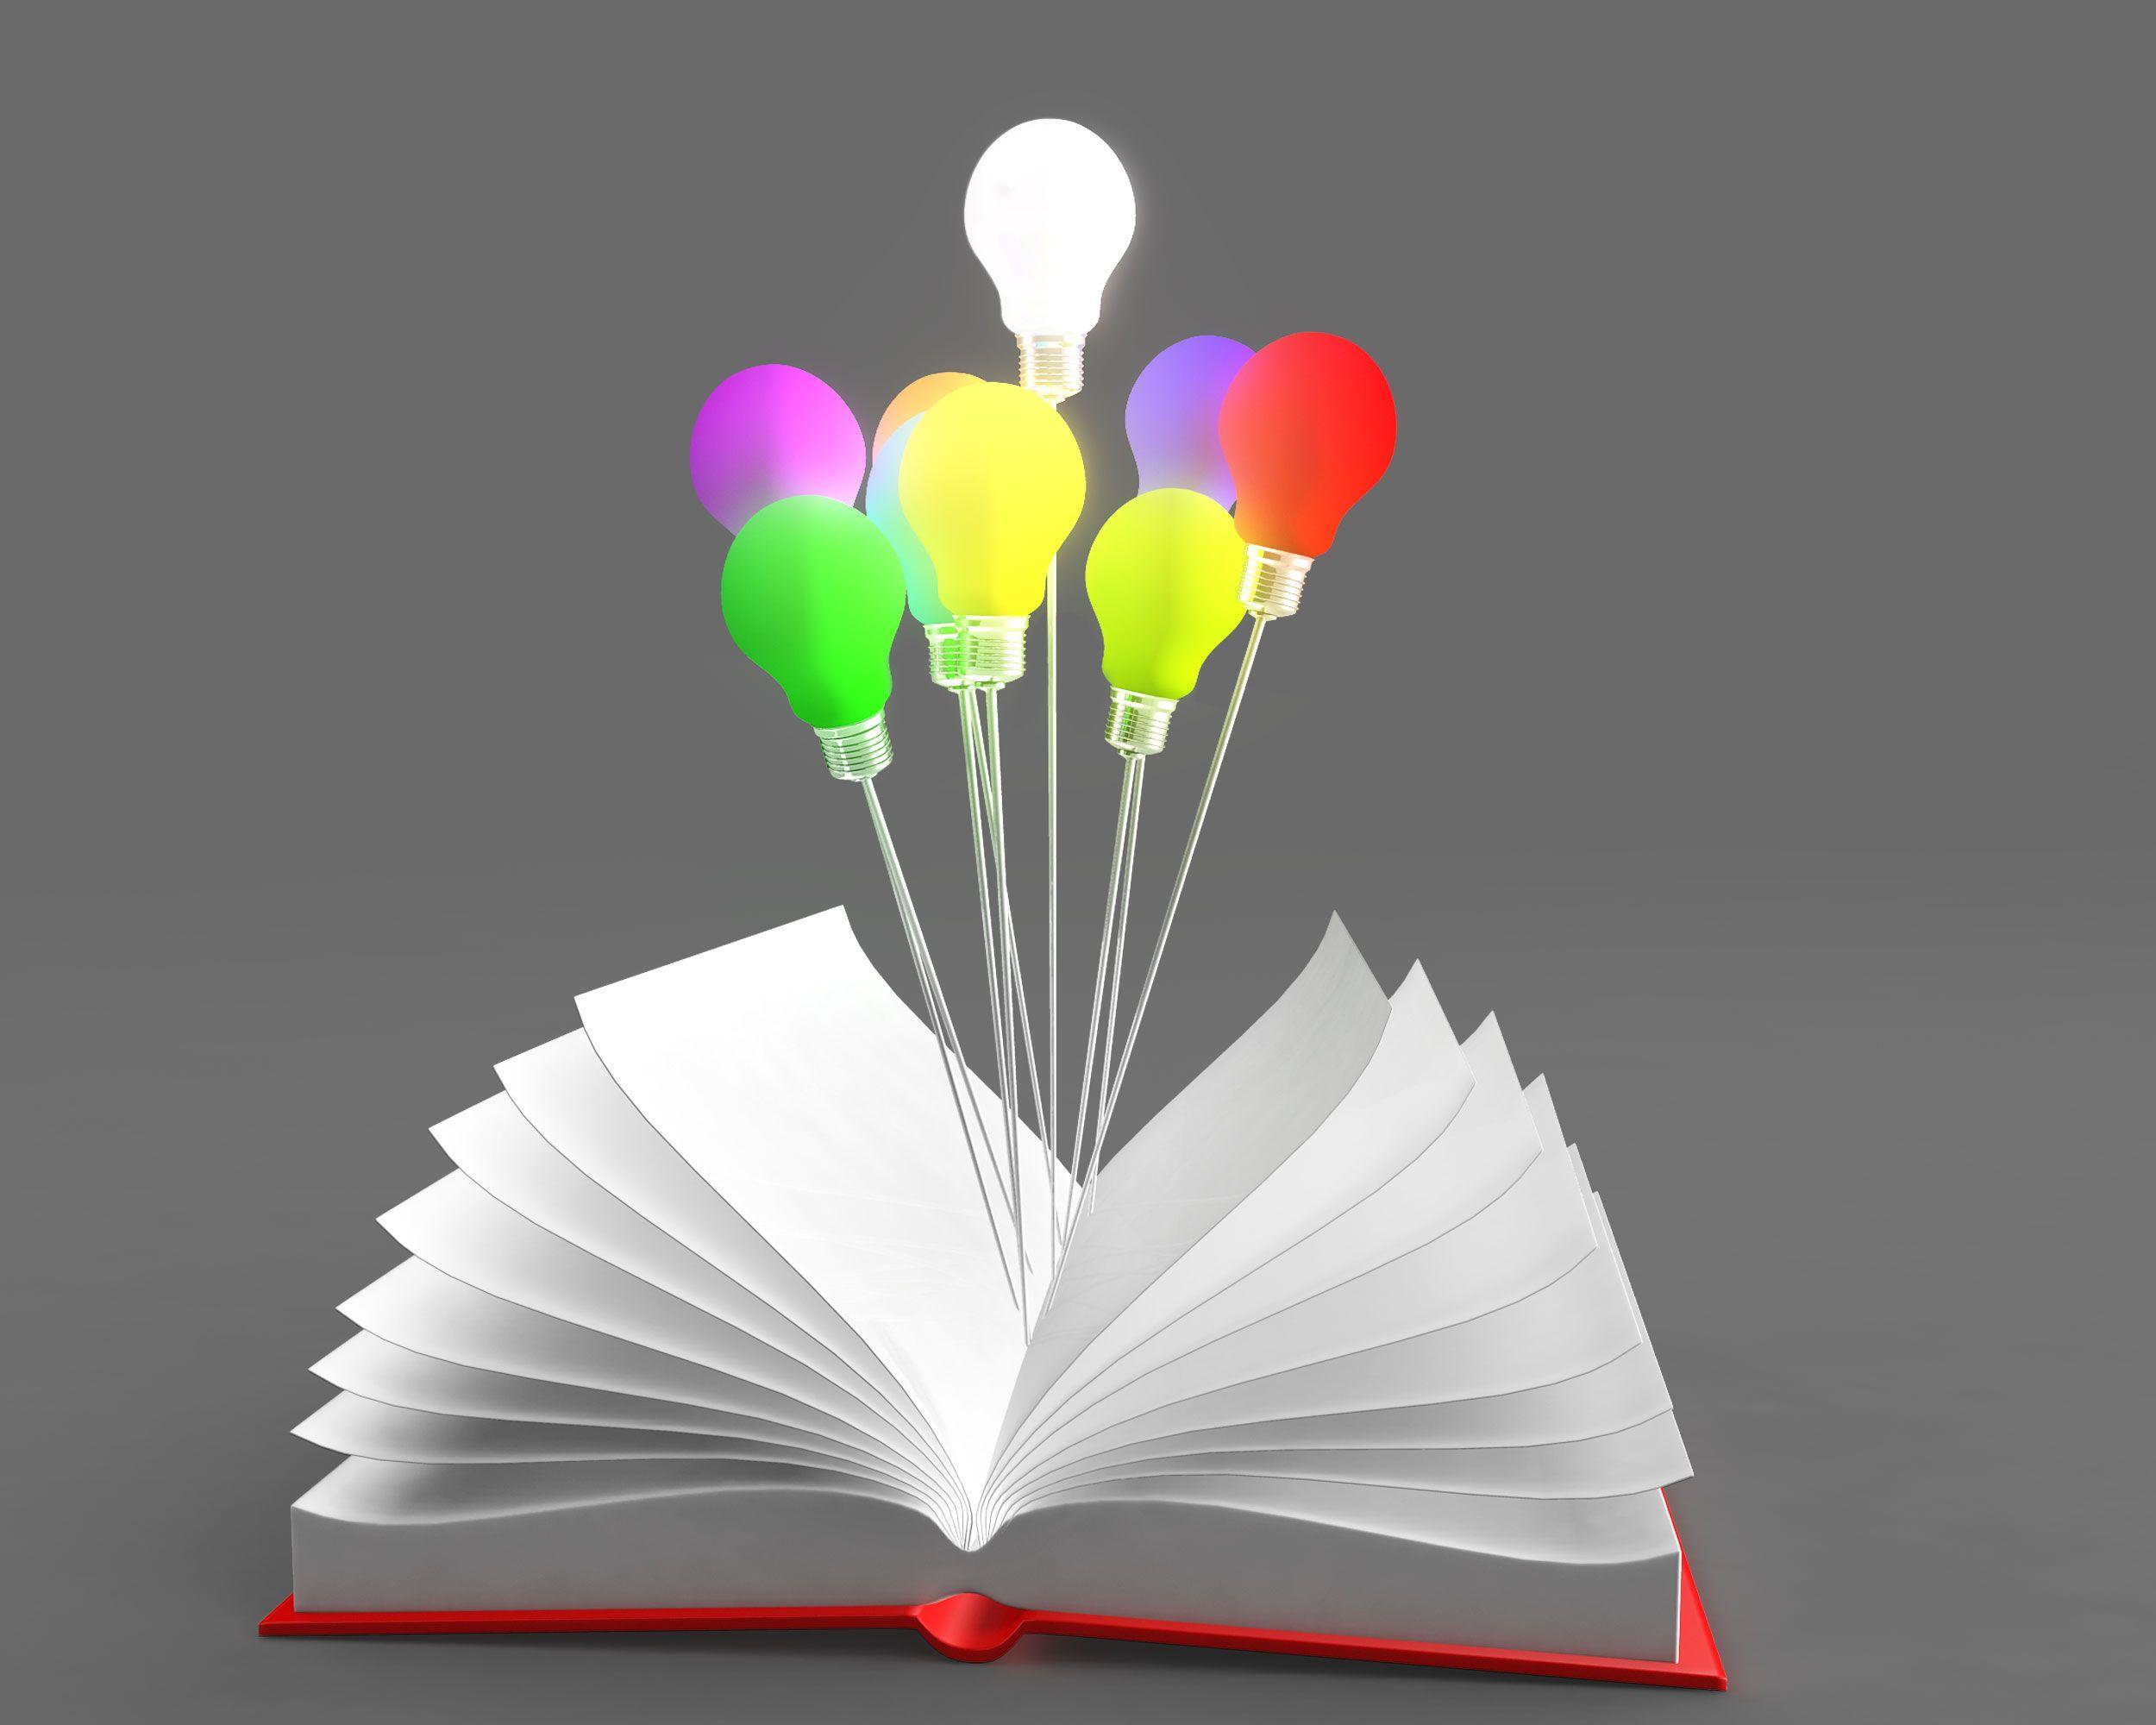 colorful_light_bulbs_on_open_book_stock_photo_Slide01